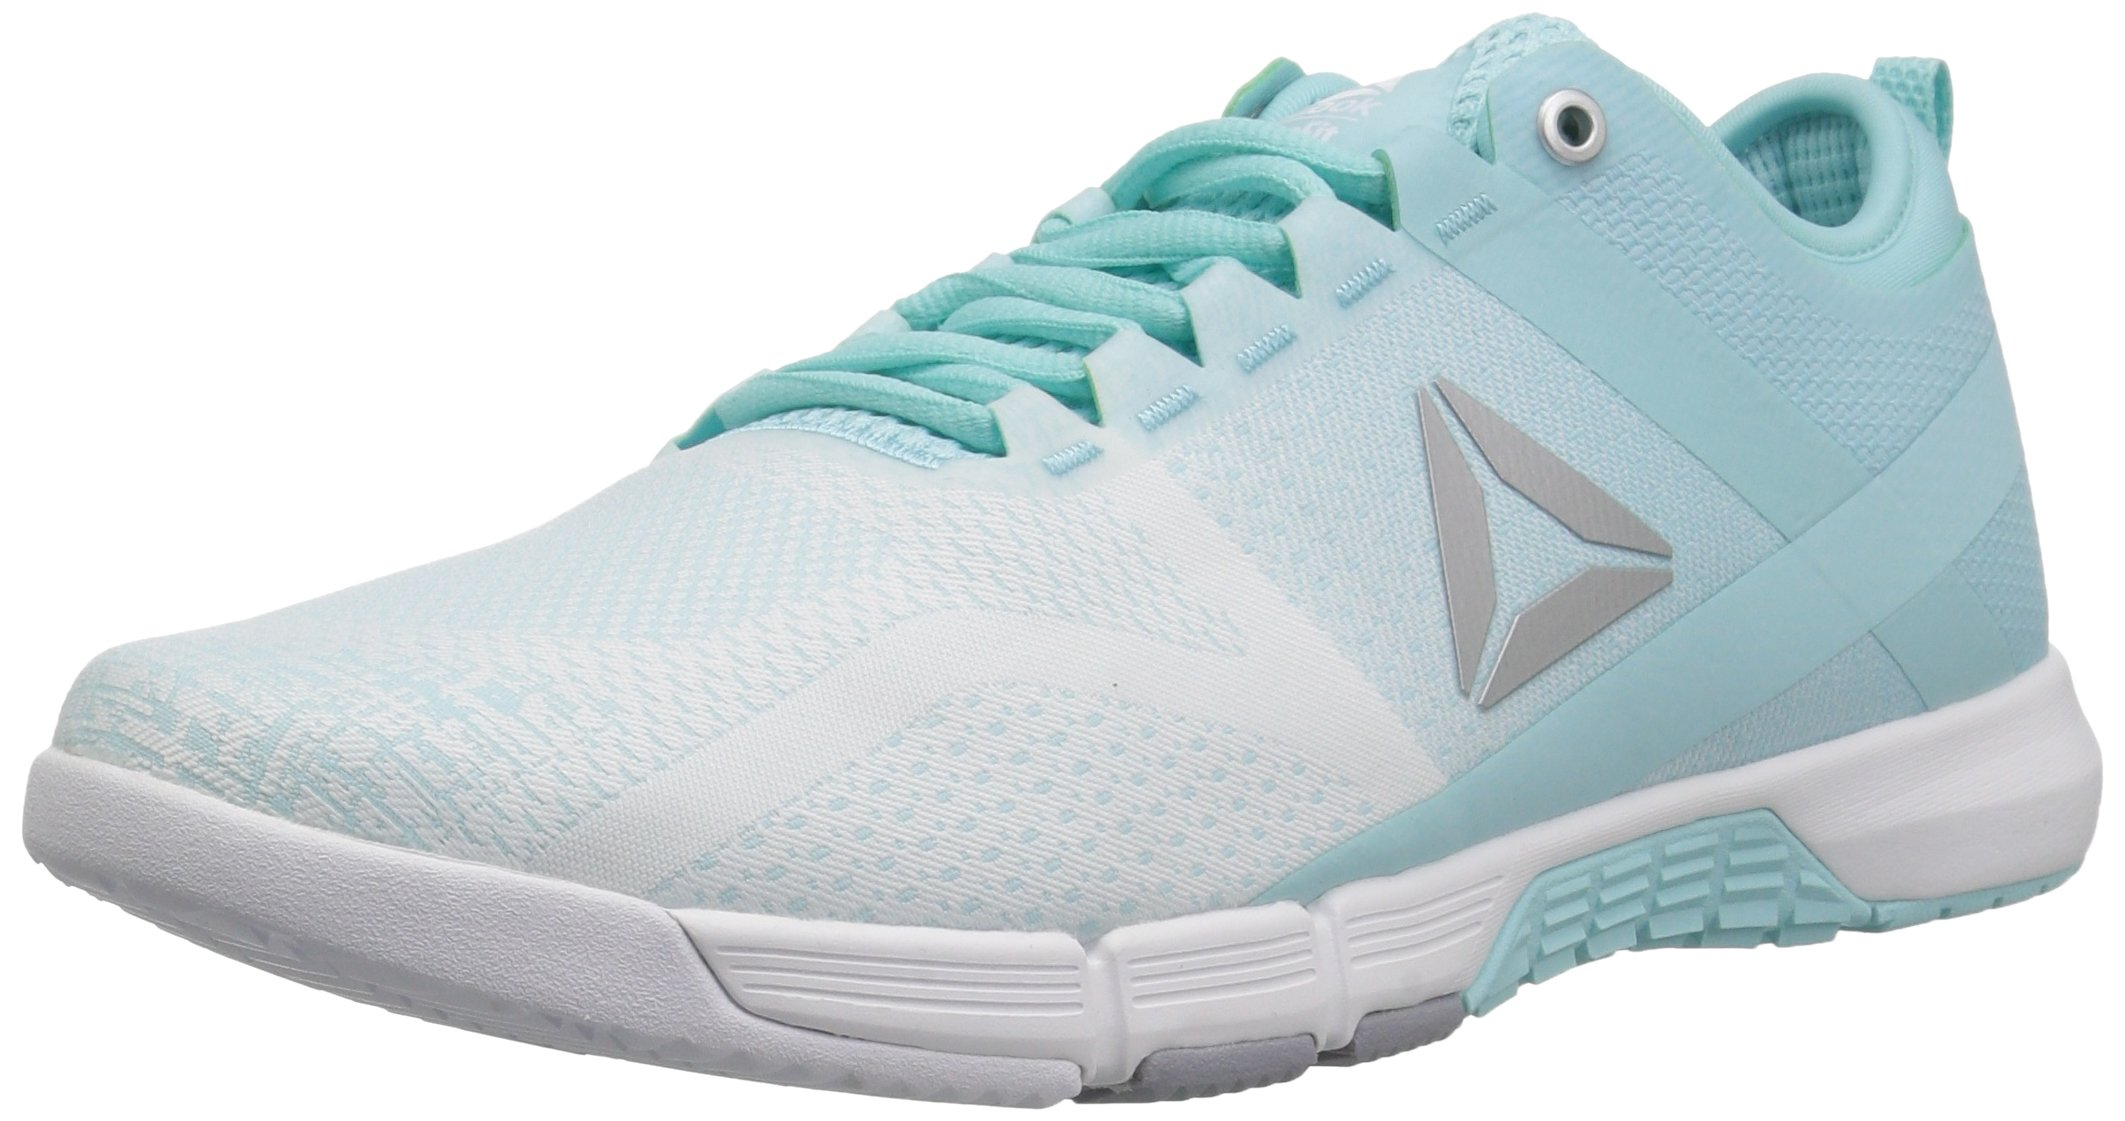 Reebok Women's Crossfit Grace Tr Cross Trainer, Blue Lagoon/White/Cool Sh, 11 M US